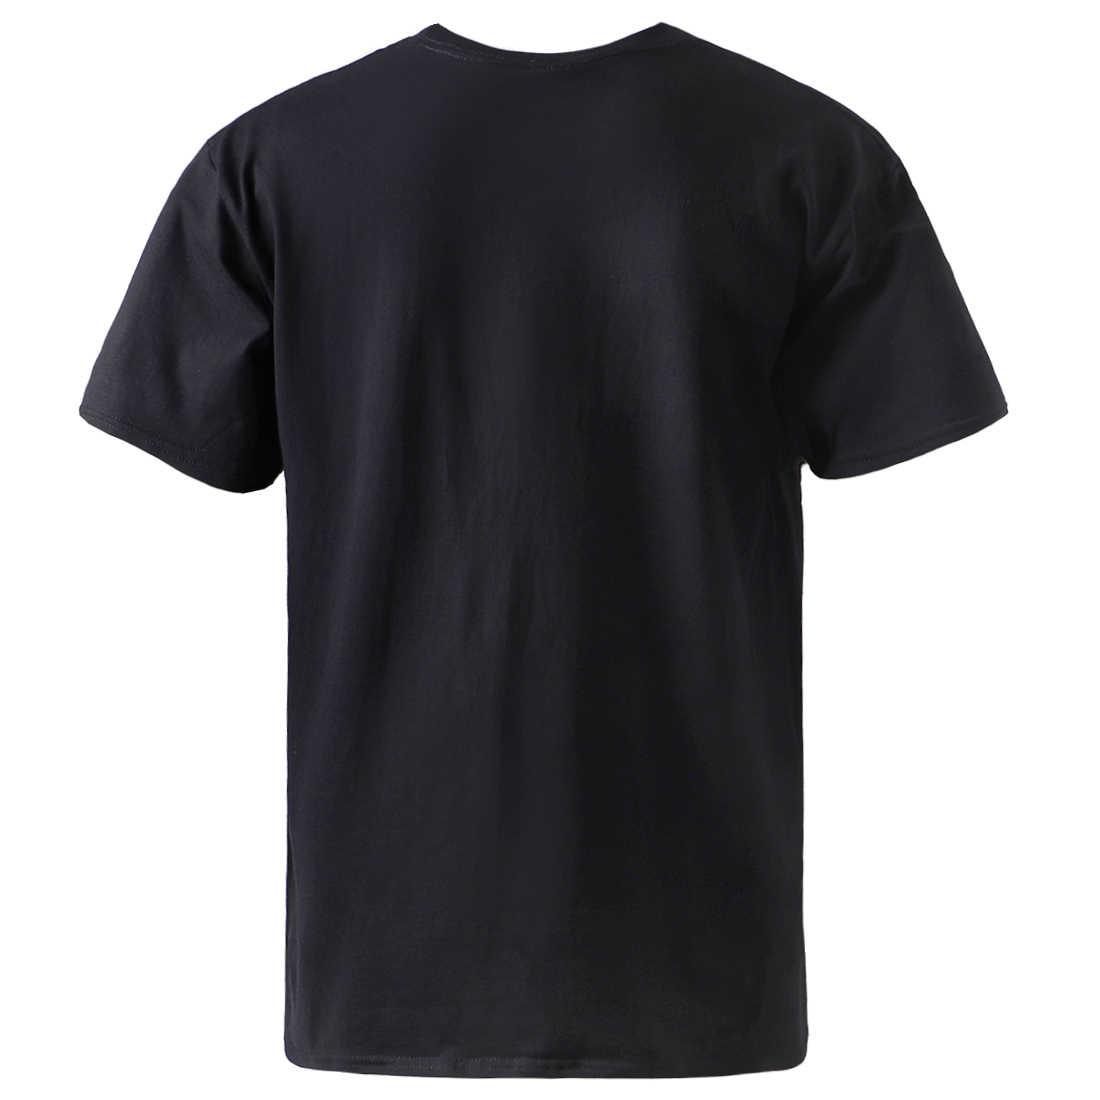 Peaky Blinder Mens Tshirt Katoenen Top 2020 Zomer Korte Mouw T-shirt Fashion Hoge Kwaliteit Katoen Streetwear Tshirt Plus Tee